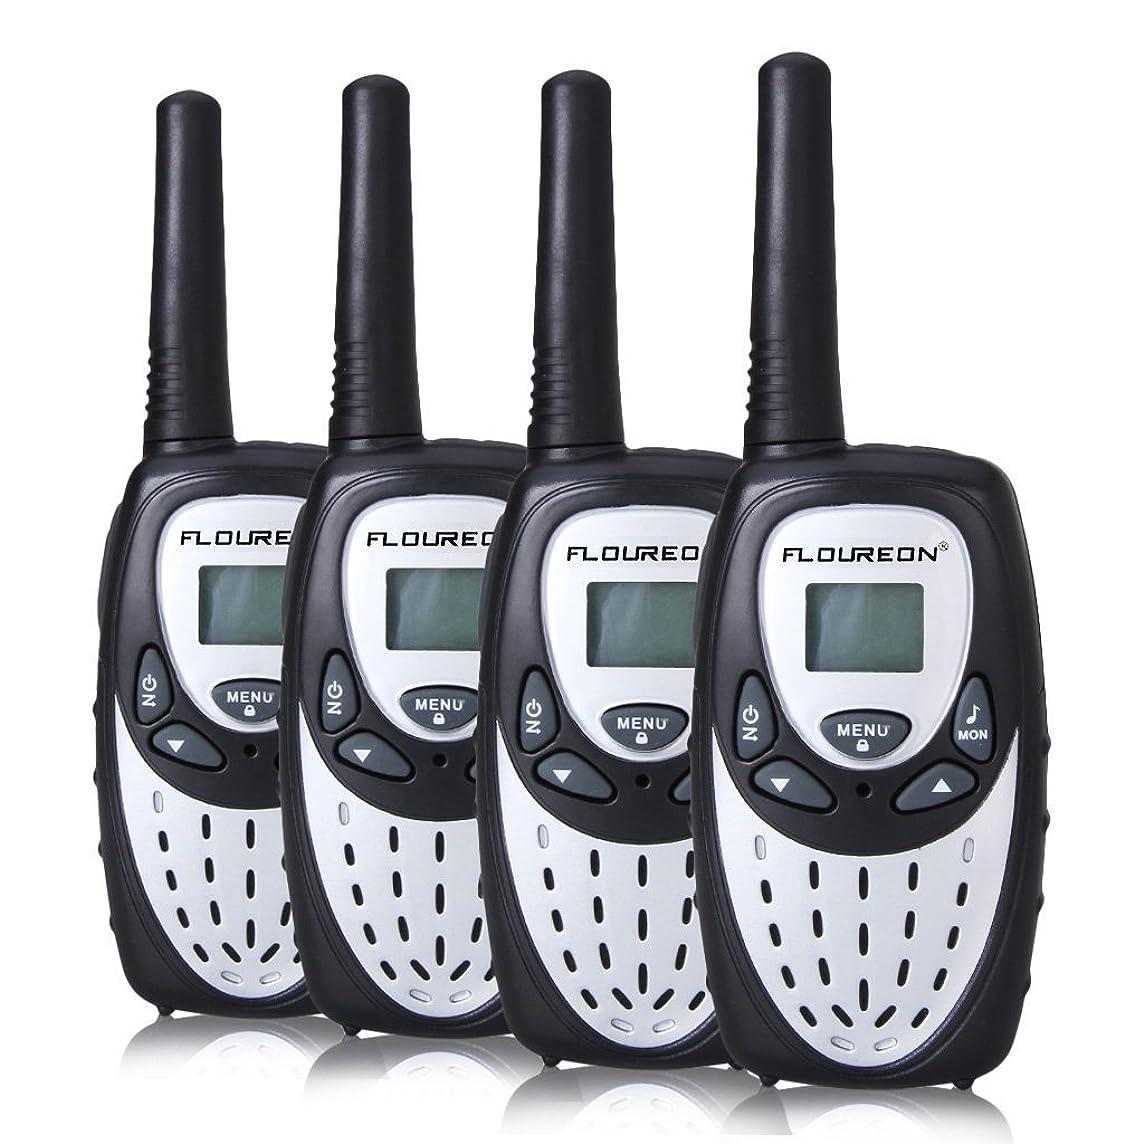 FLOUREON 4 Packs Walkie Talkies Two Way Radios 22 Channel 3000M (MAX 5000M Open Field) UHF Long Range Handheld Talkies Talky (Silver)